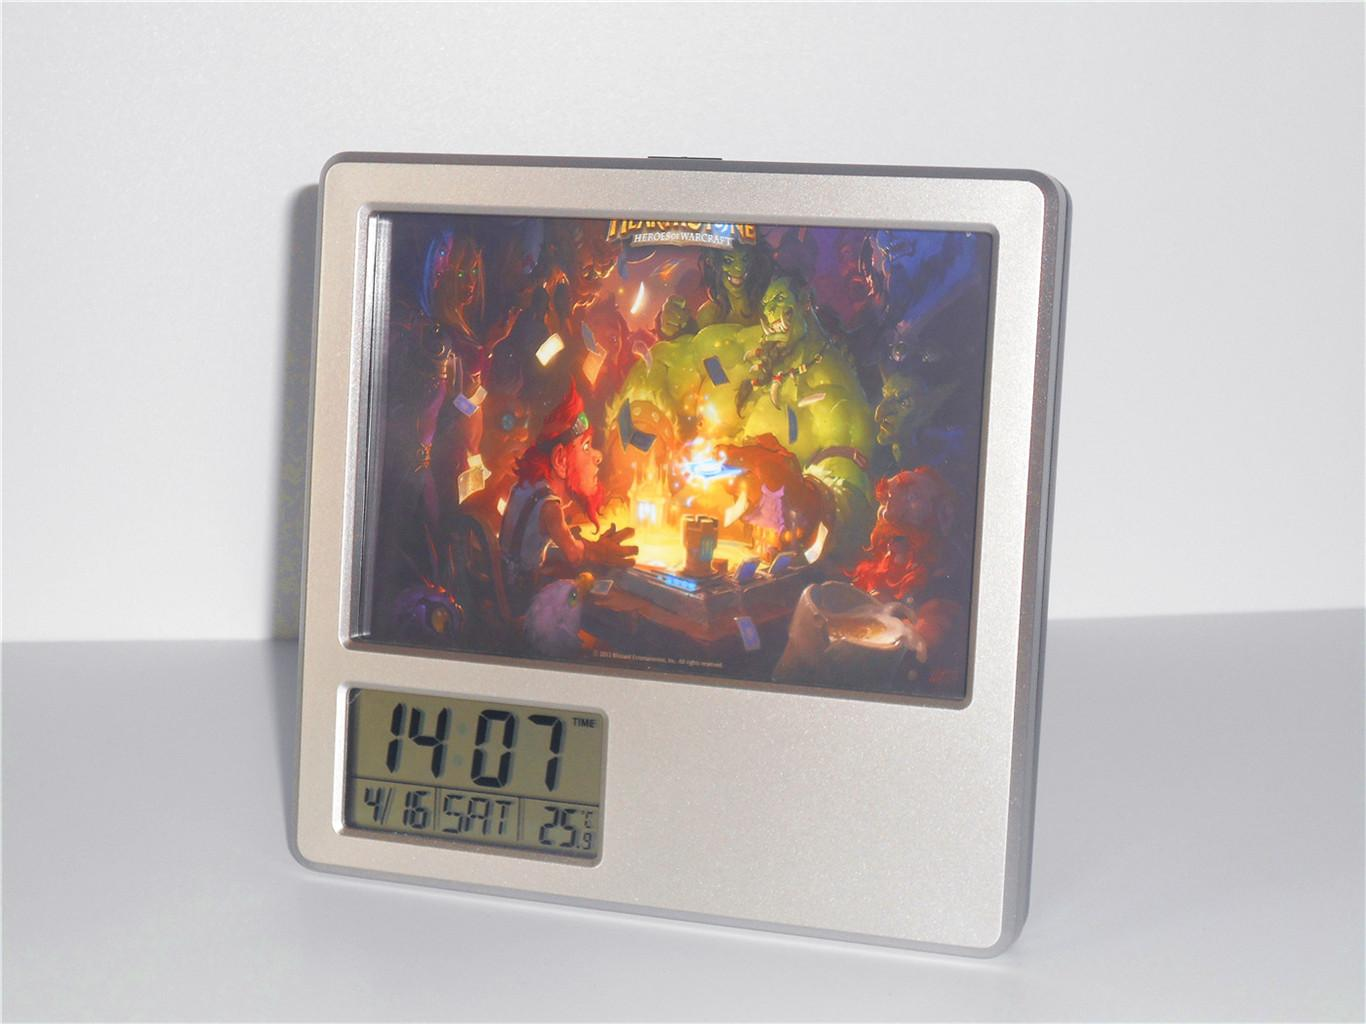 Creative Digital Calendar 2017 new cards creative digital alarm clock multi function desk